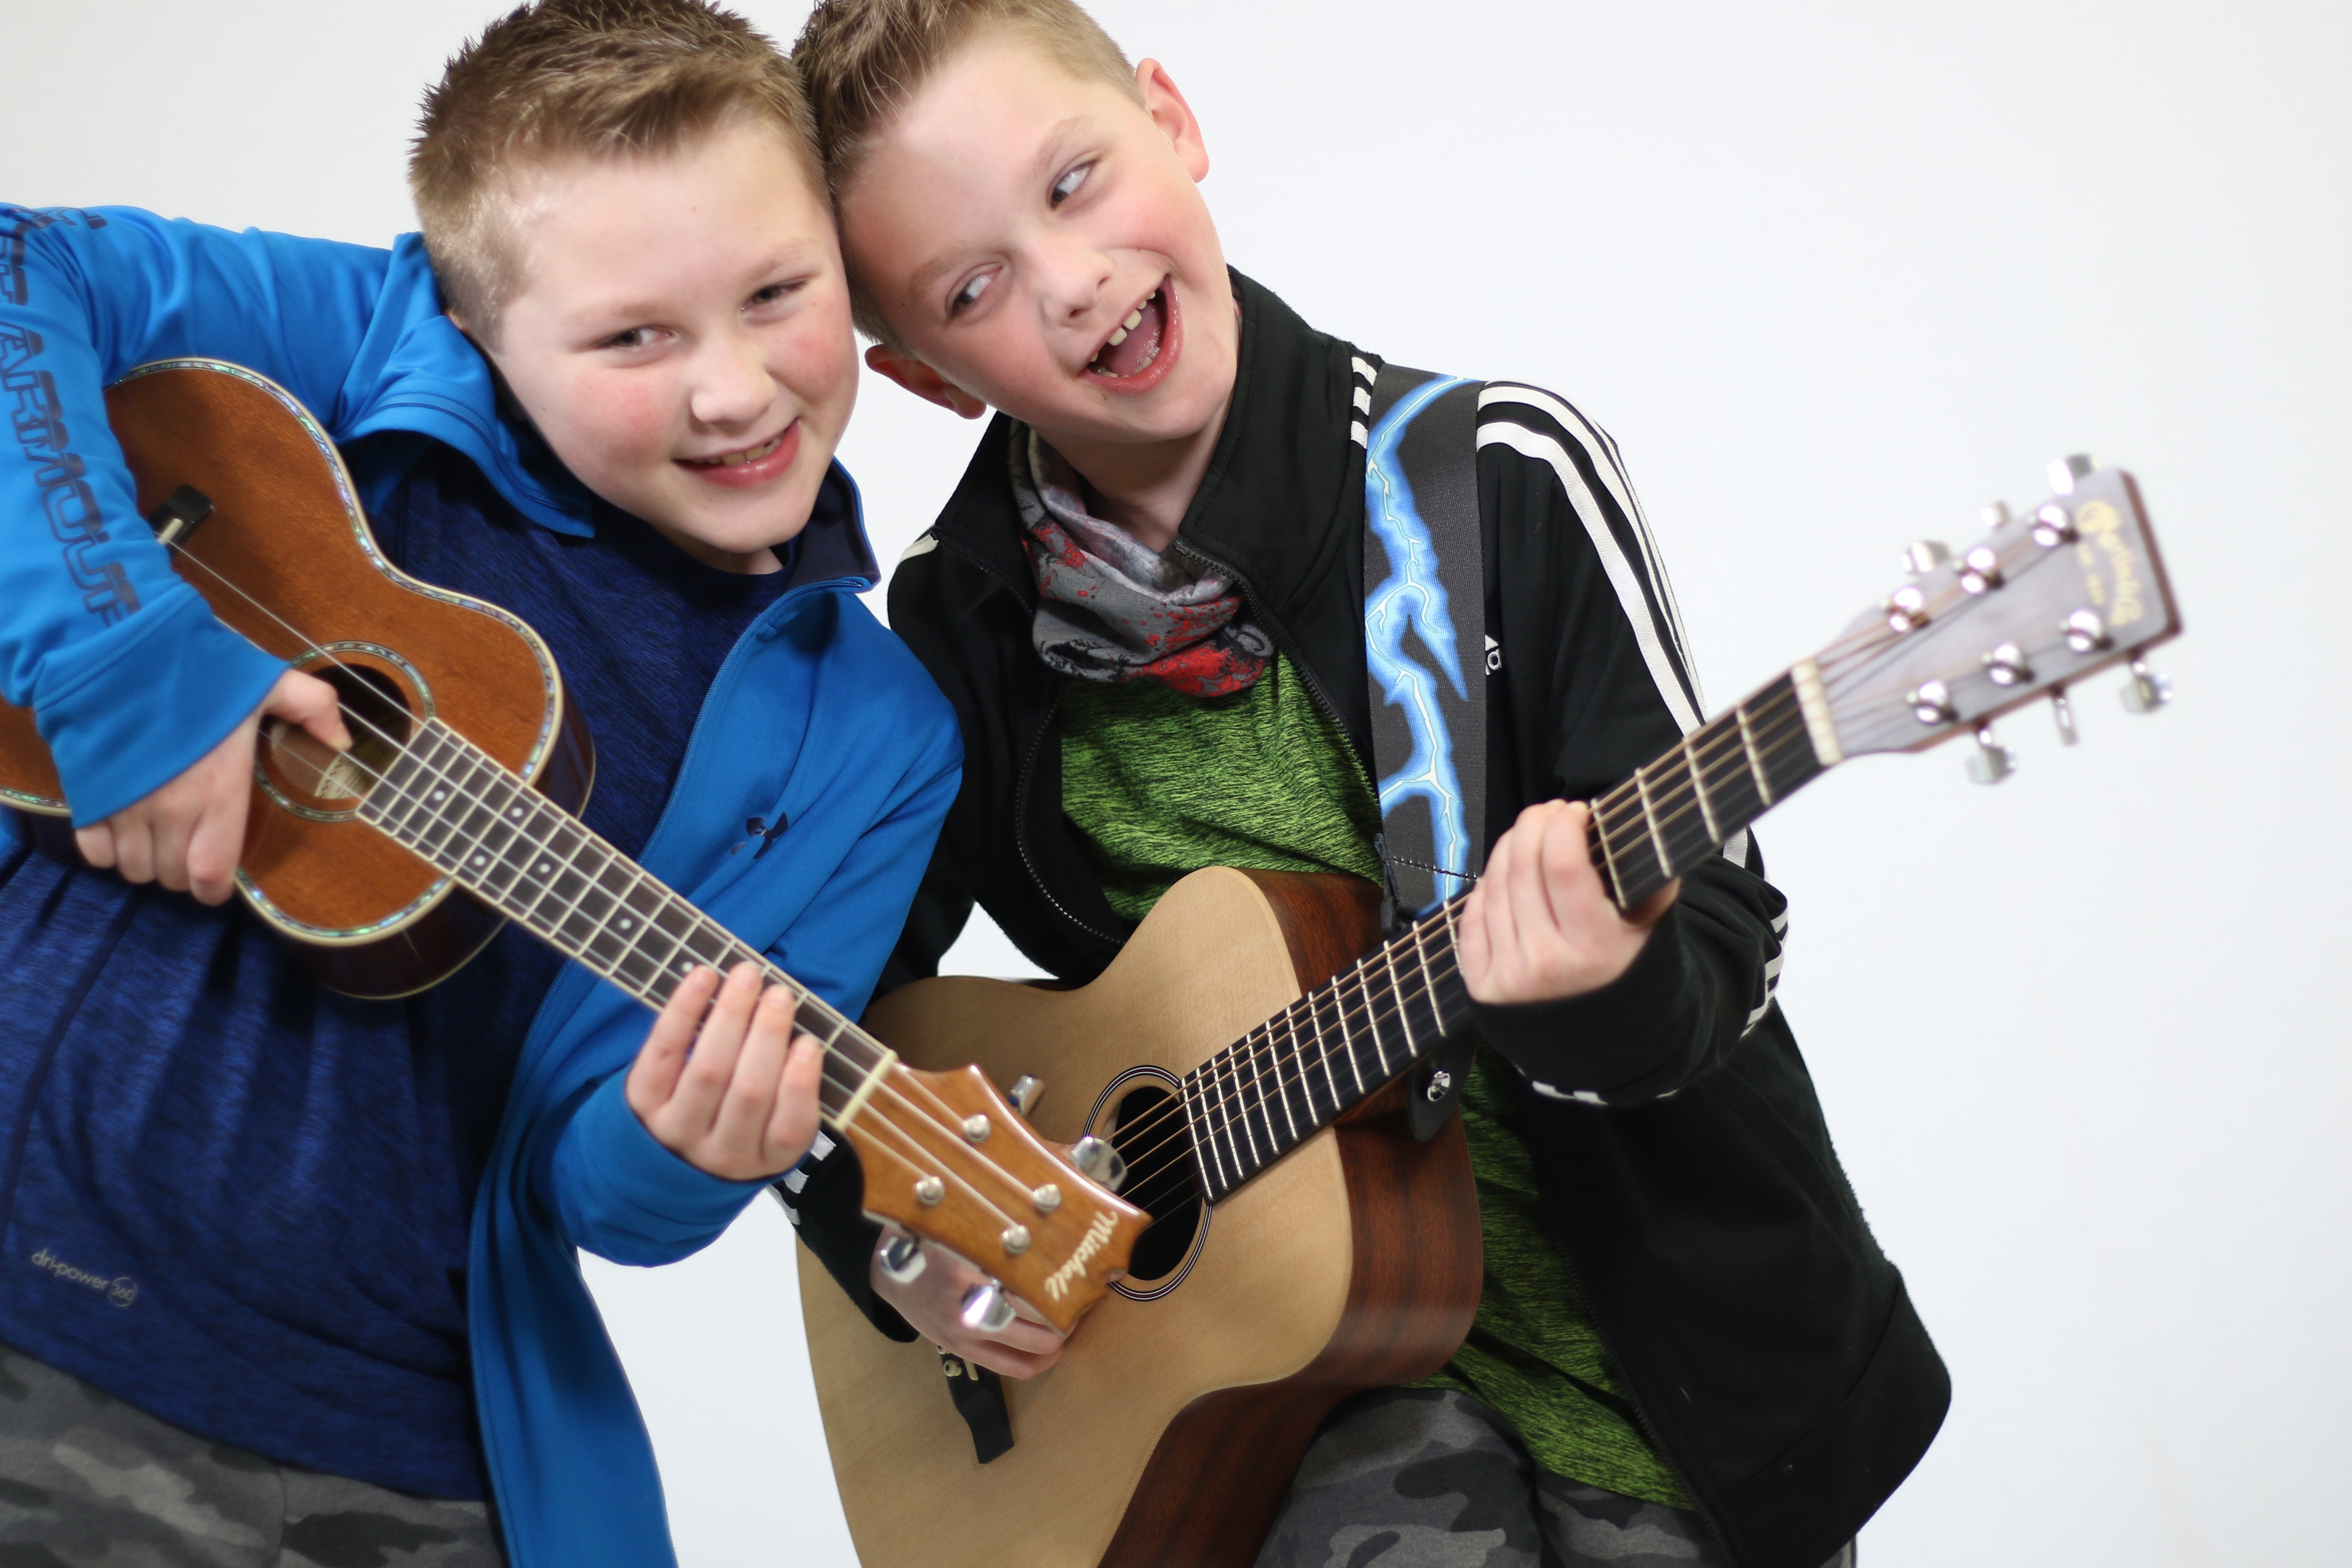 2 guitar lesson boys